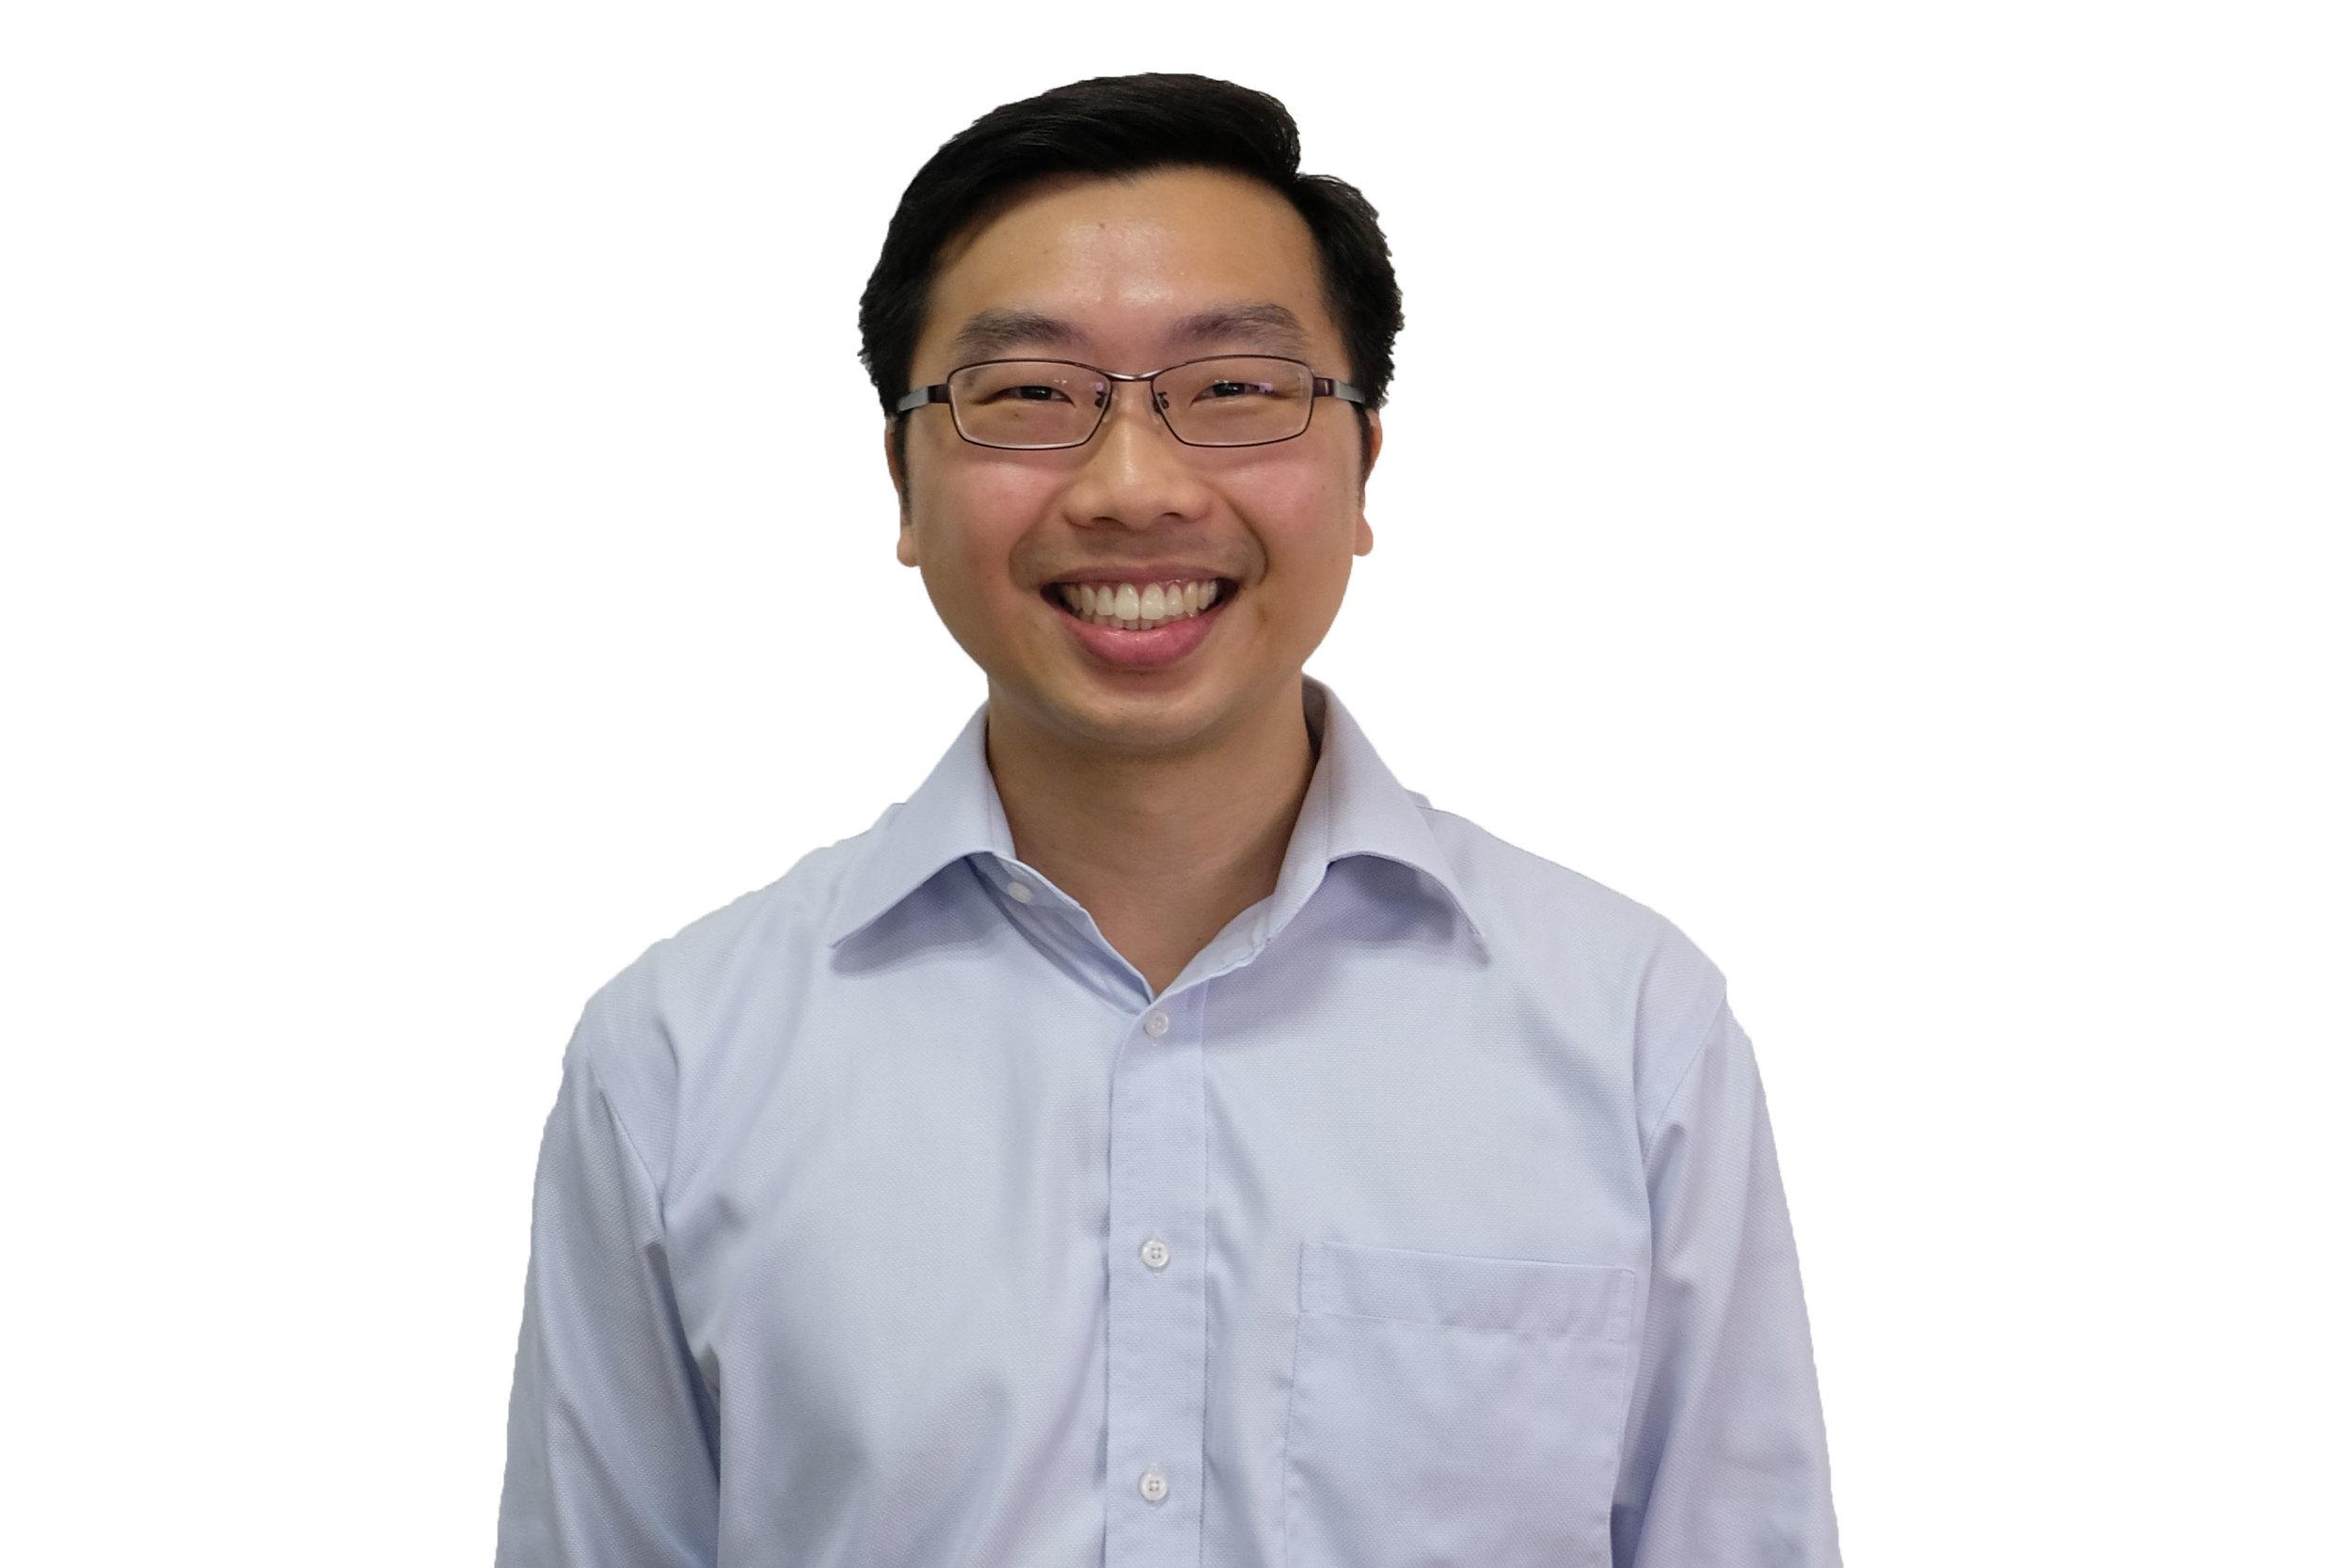 Jeremy Lee - Community Groups